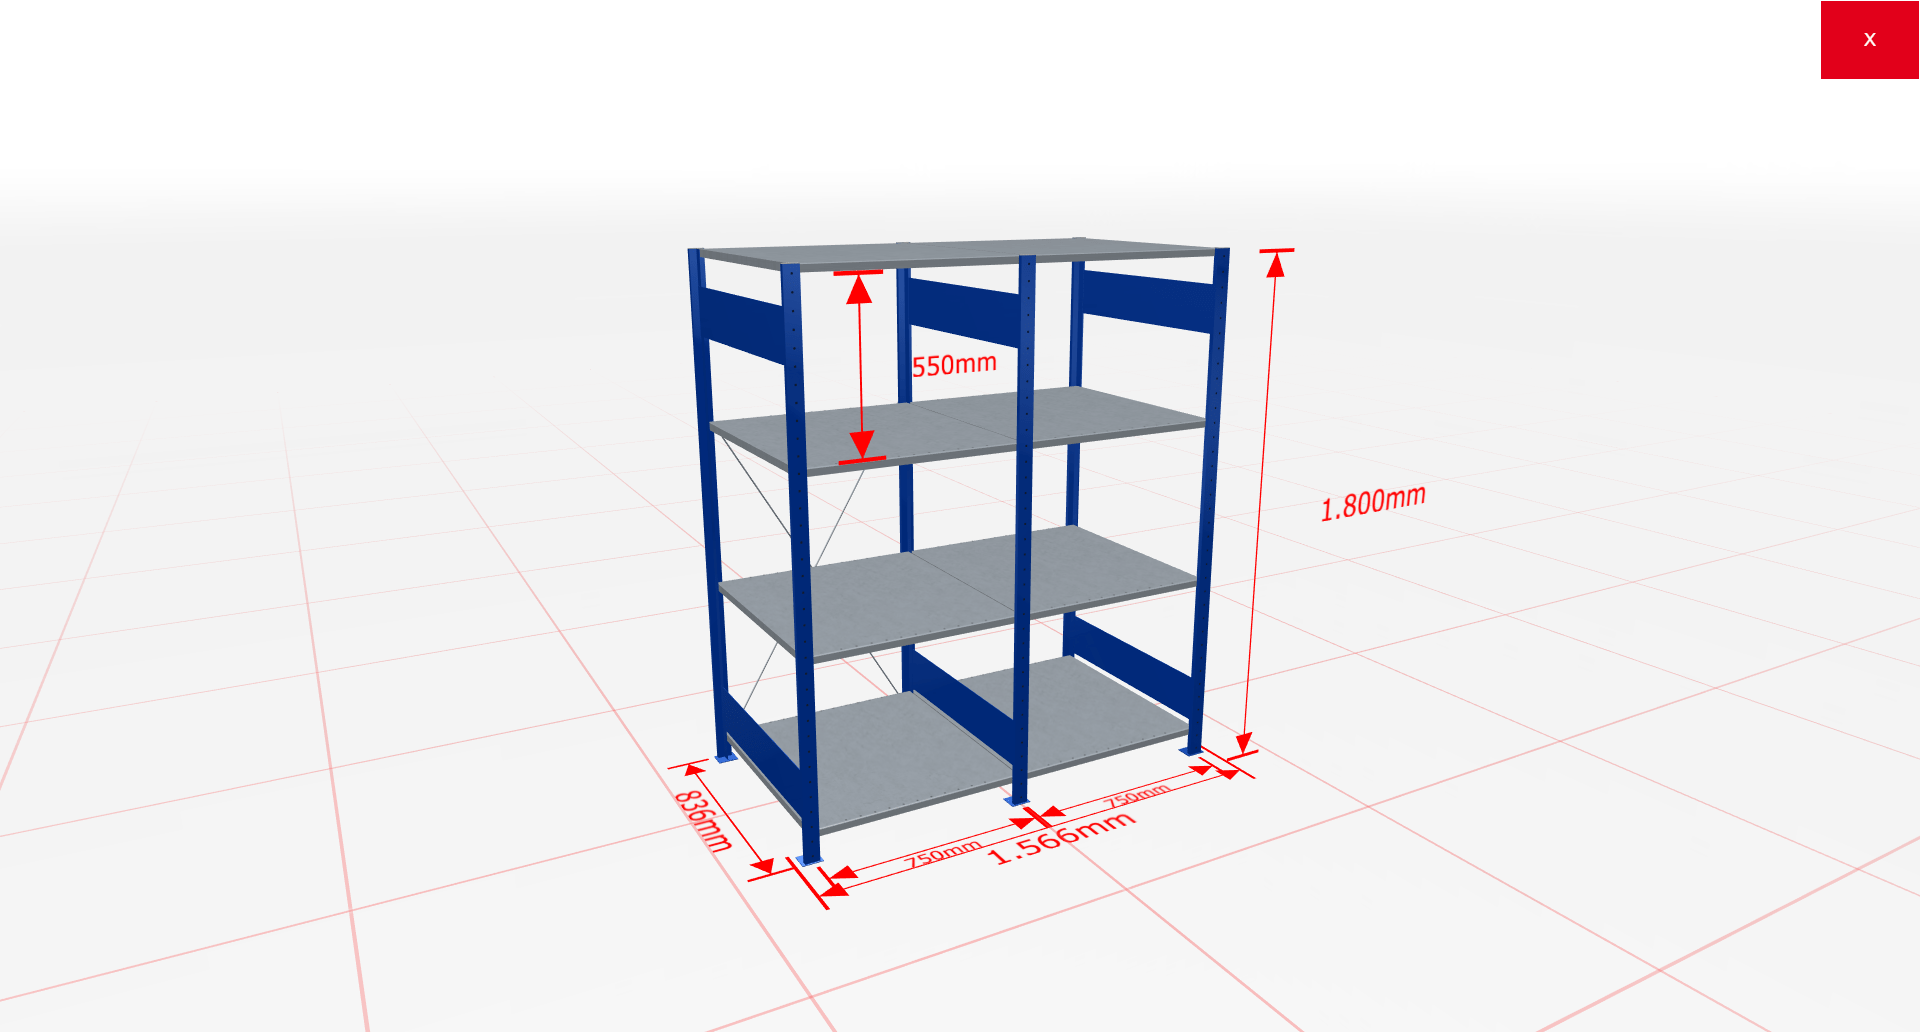 Fachbodenregal Komplettregal 1800x1566x800 mm (HxBxT) SCHULTE Lagertechnik blau 4 Ebenen  150 kg je Boden